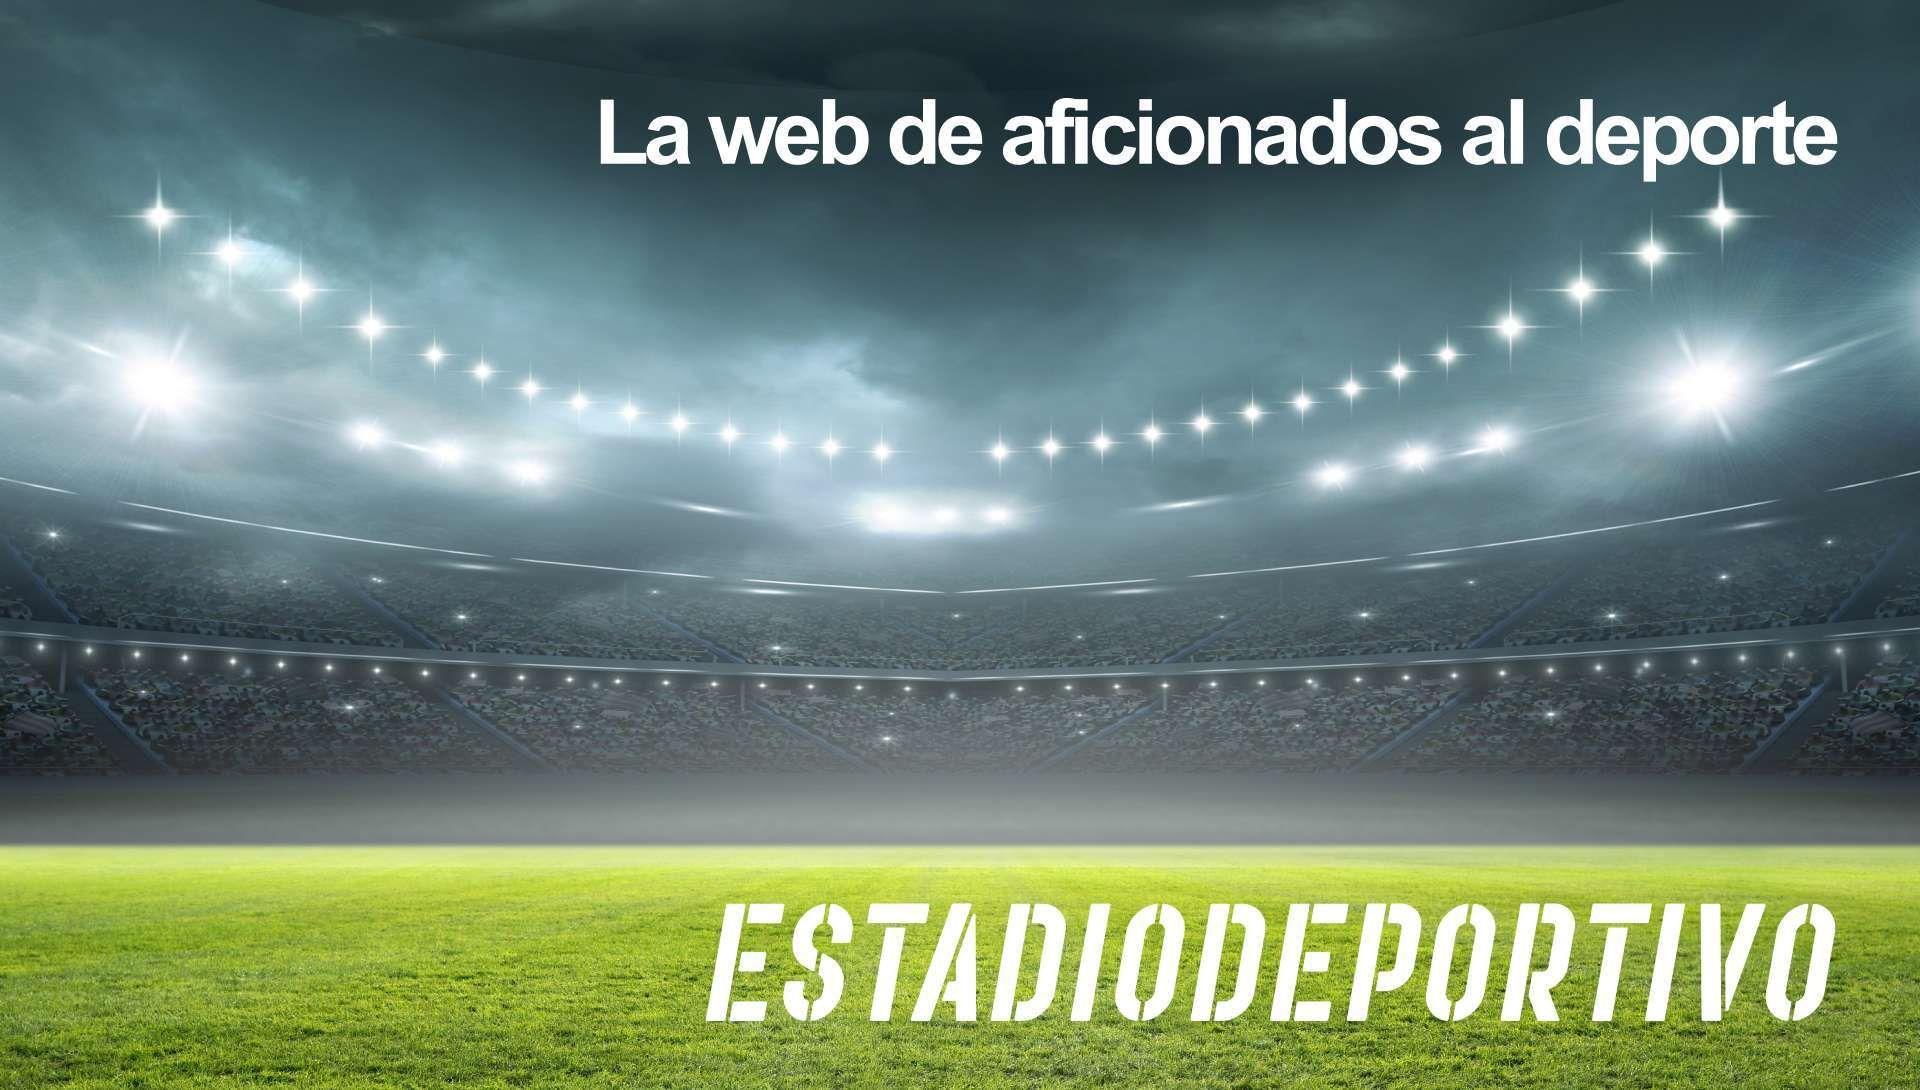 Las portadas de la prensa deportiva del sábado 3 de julio